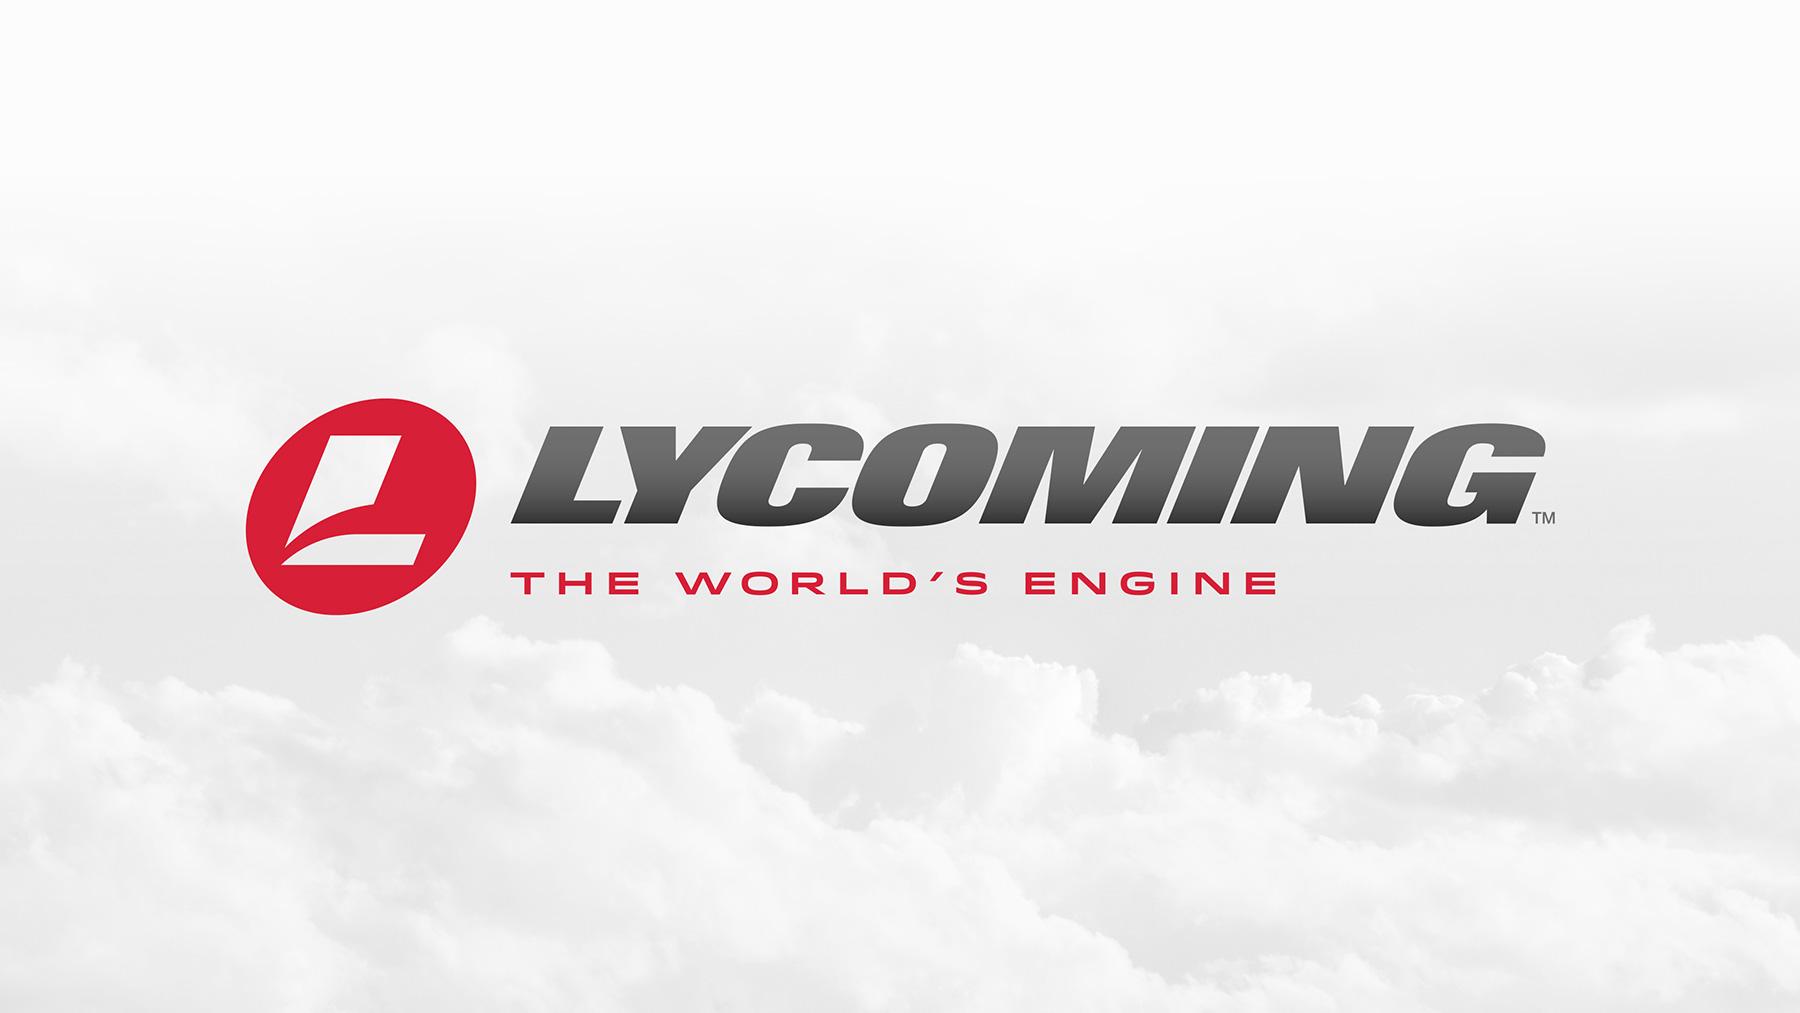 Aviation brand logo and tagline